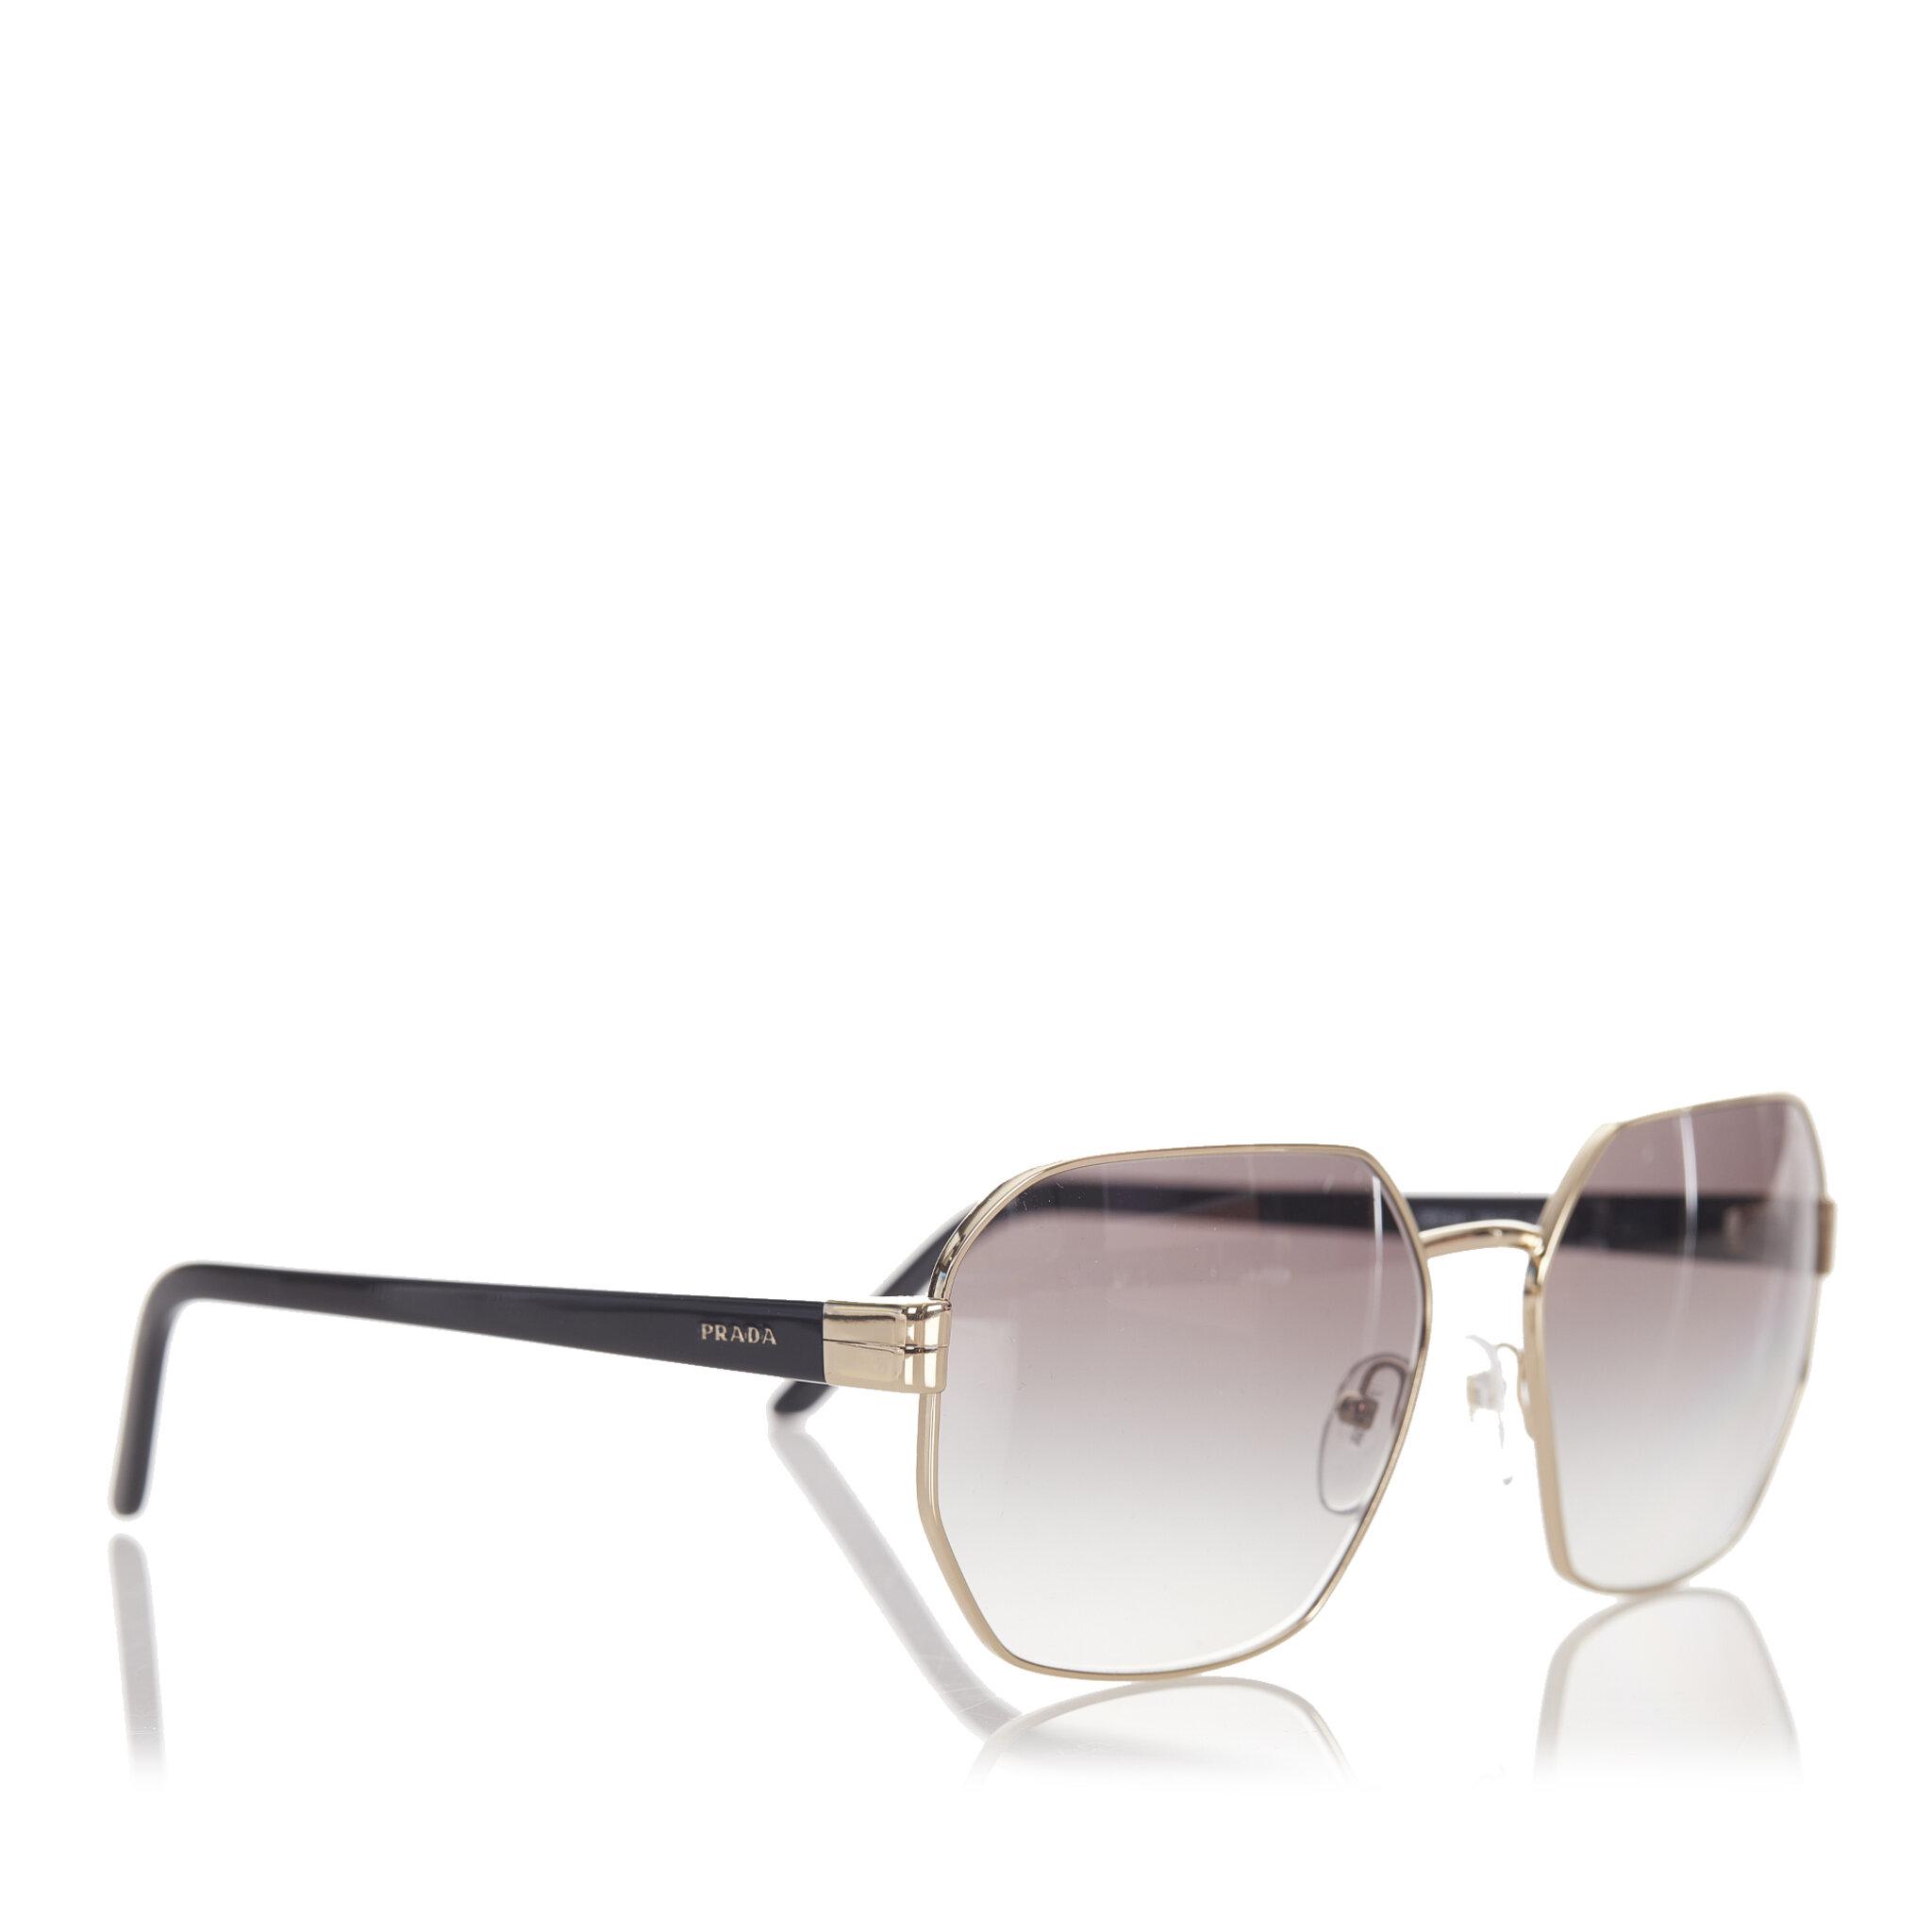 Prada Millennials Aviator Tinted Sunglasses, ONESIZE